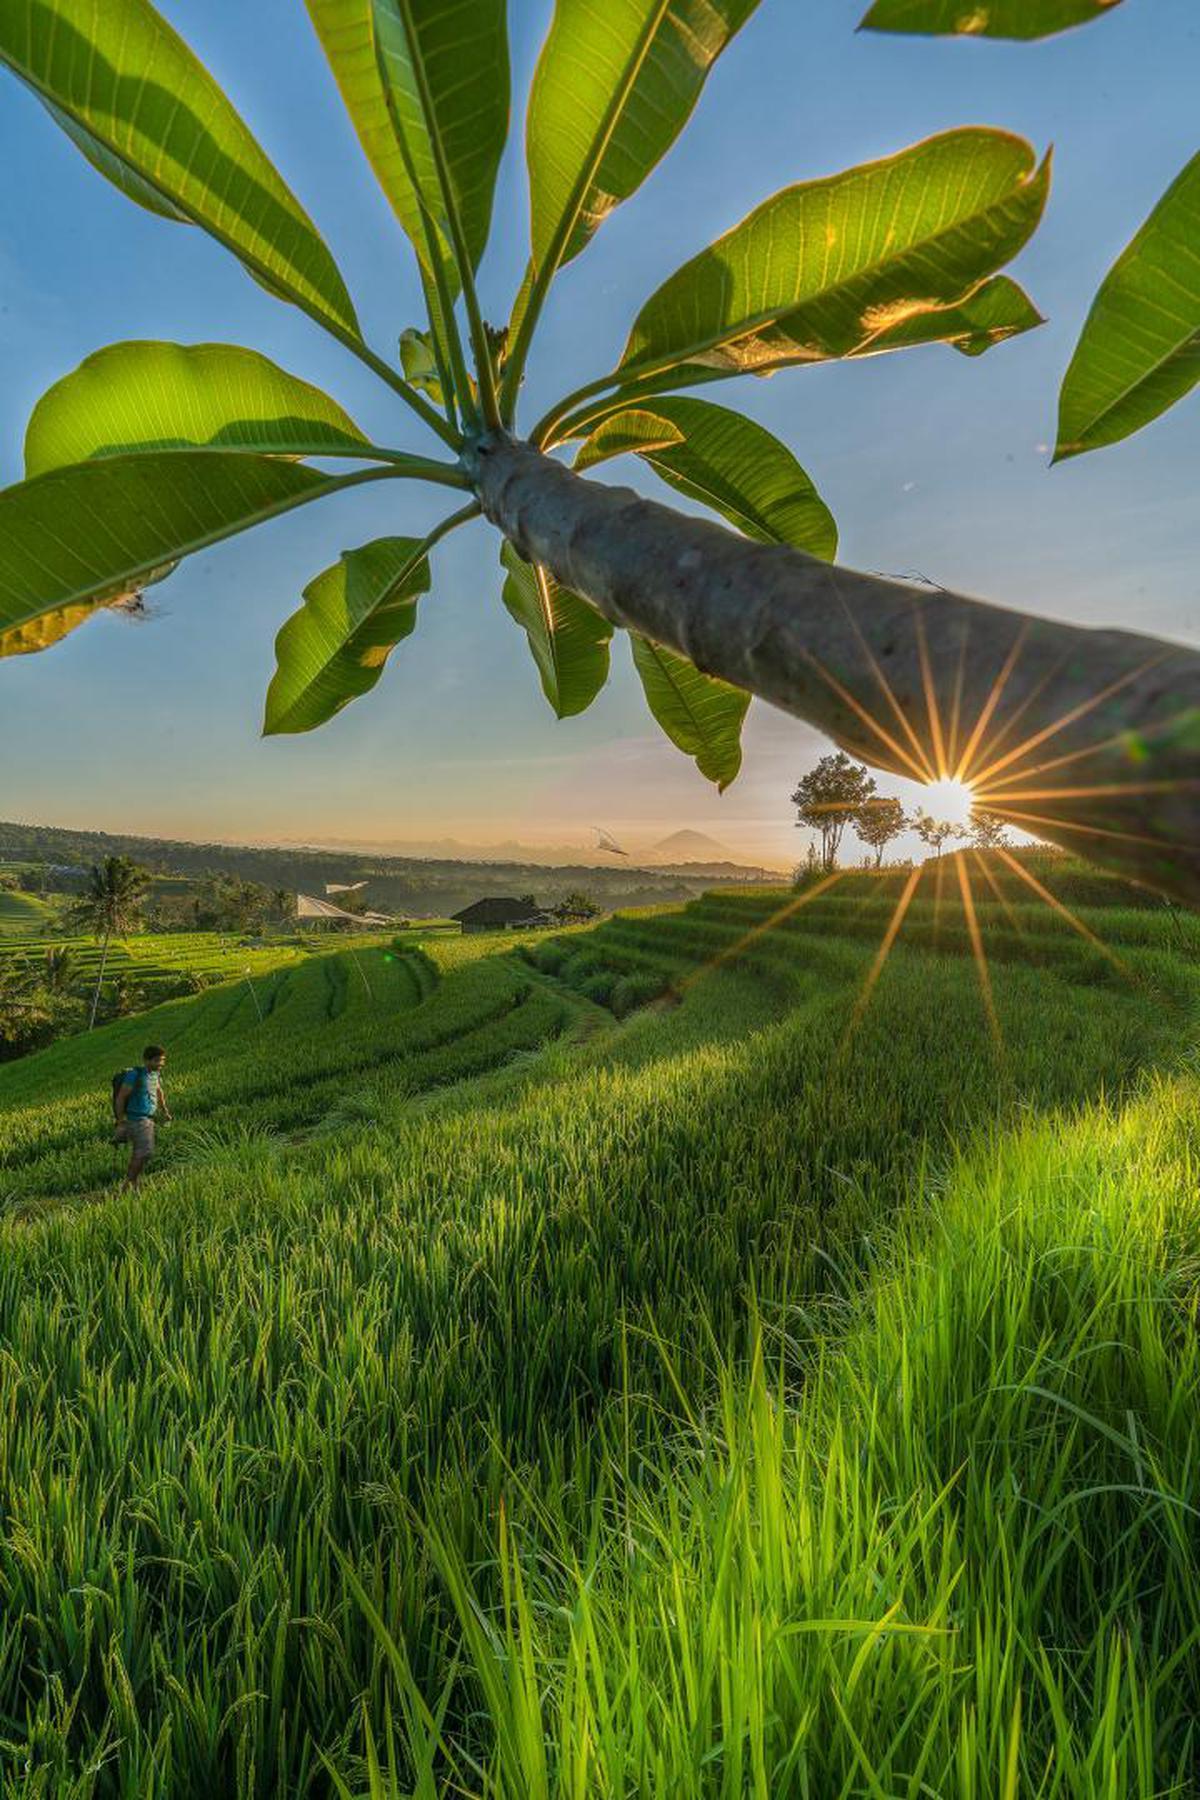 Image of Nature, Green, Leaf, Tree, Plant, Sky etc.